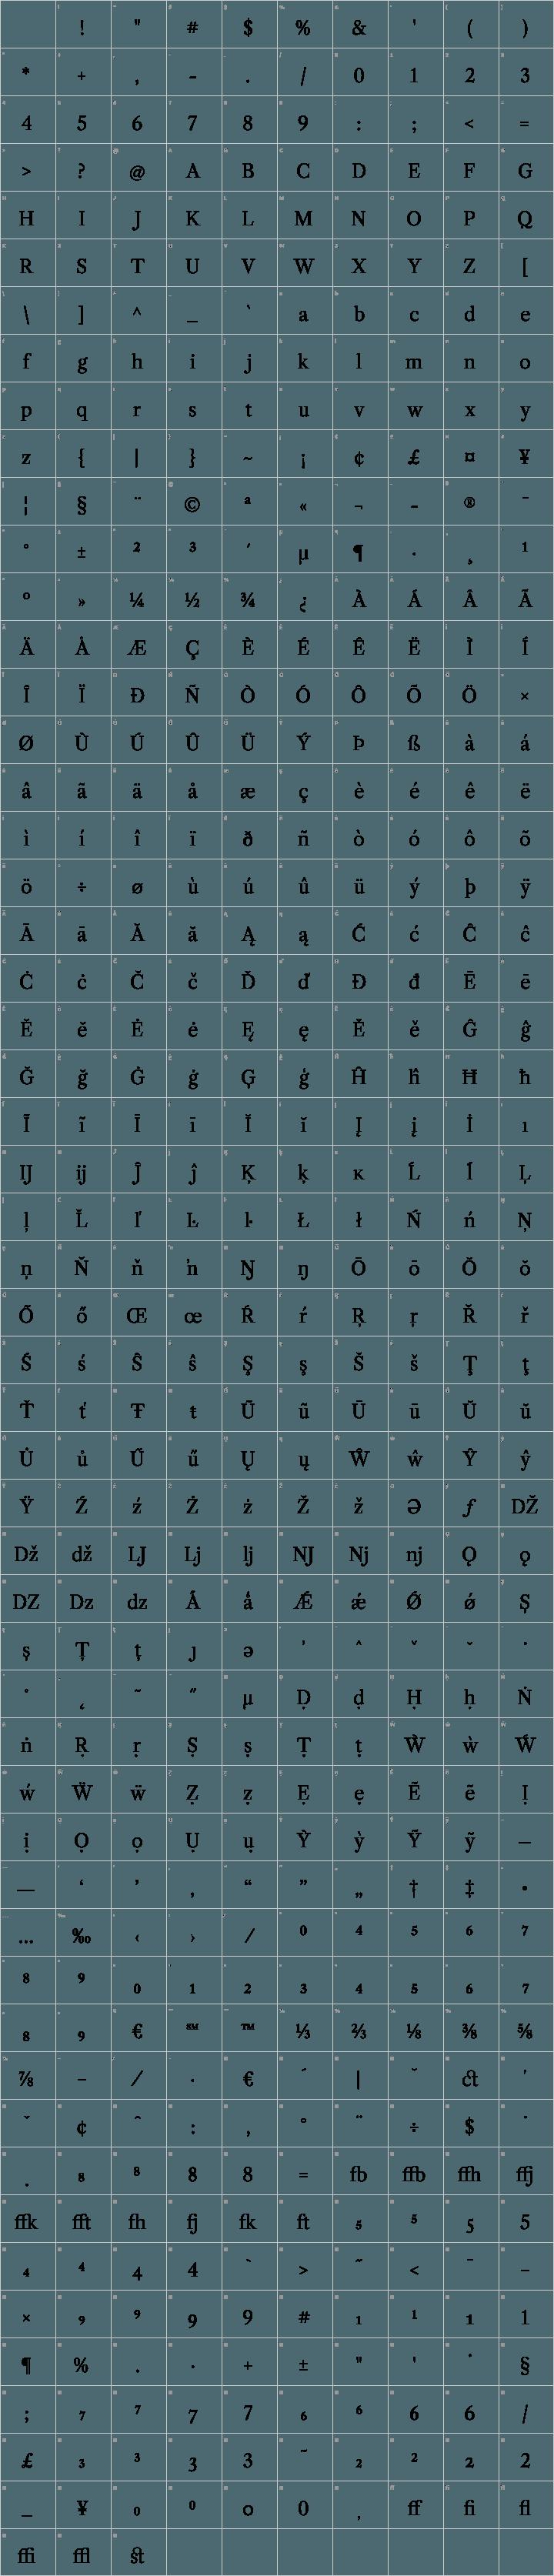 Libre Caslon Font Free by Impallari Type » Font Squirrel